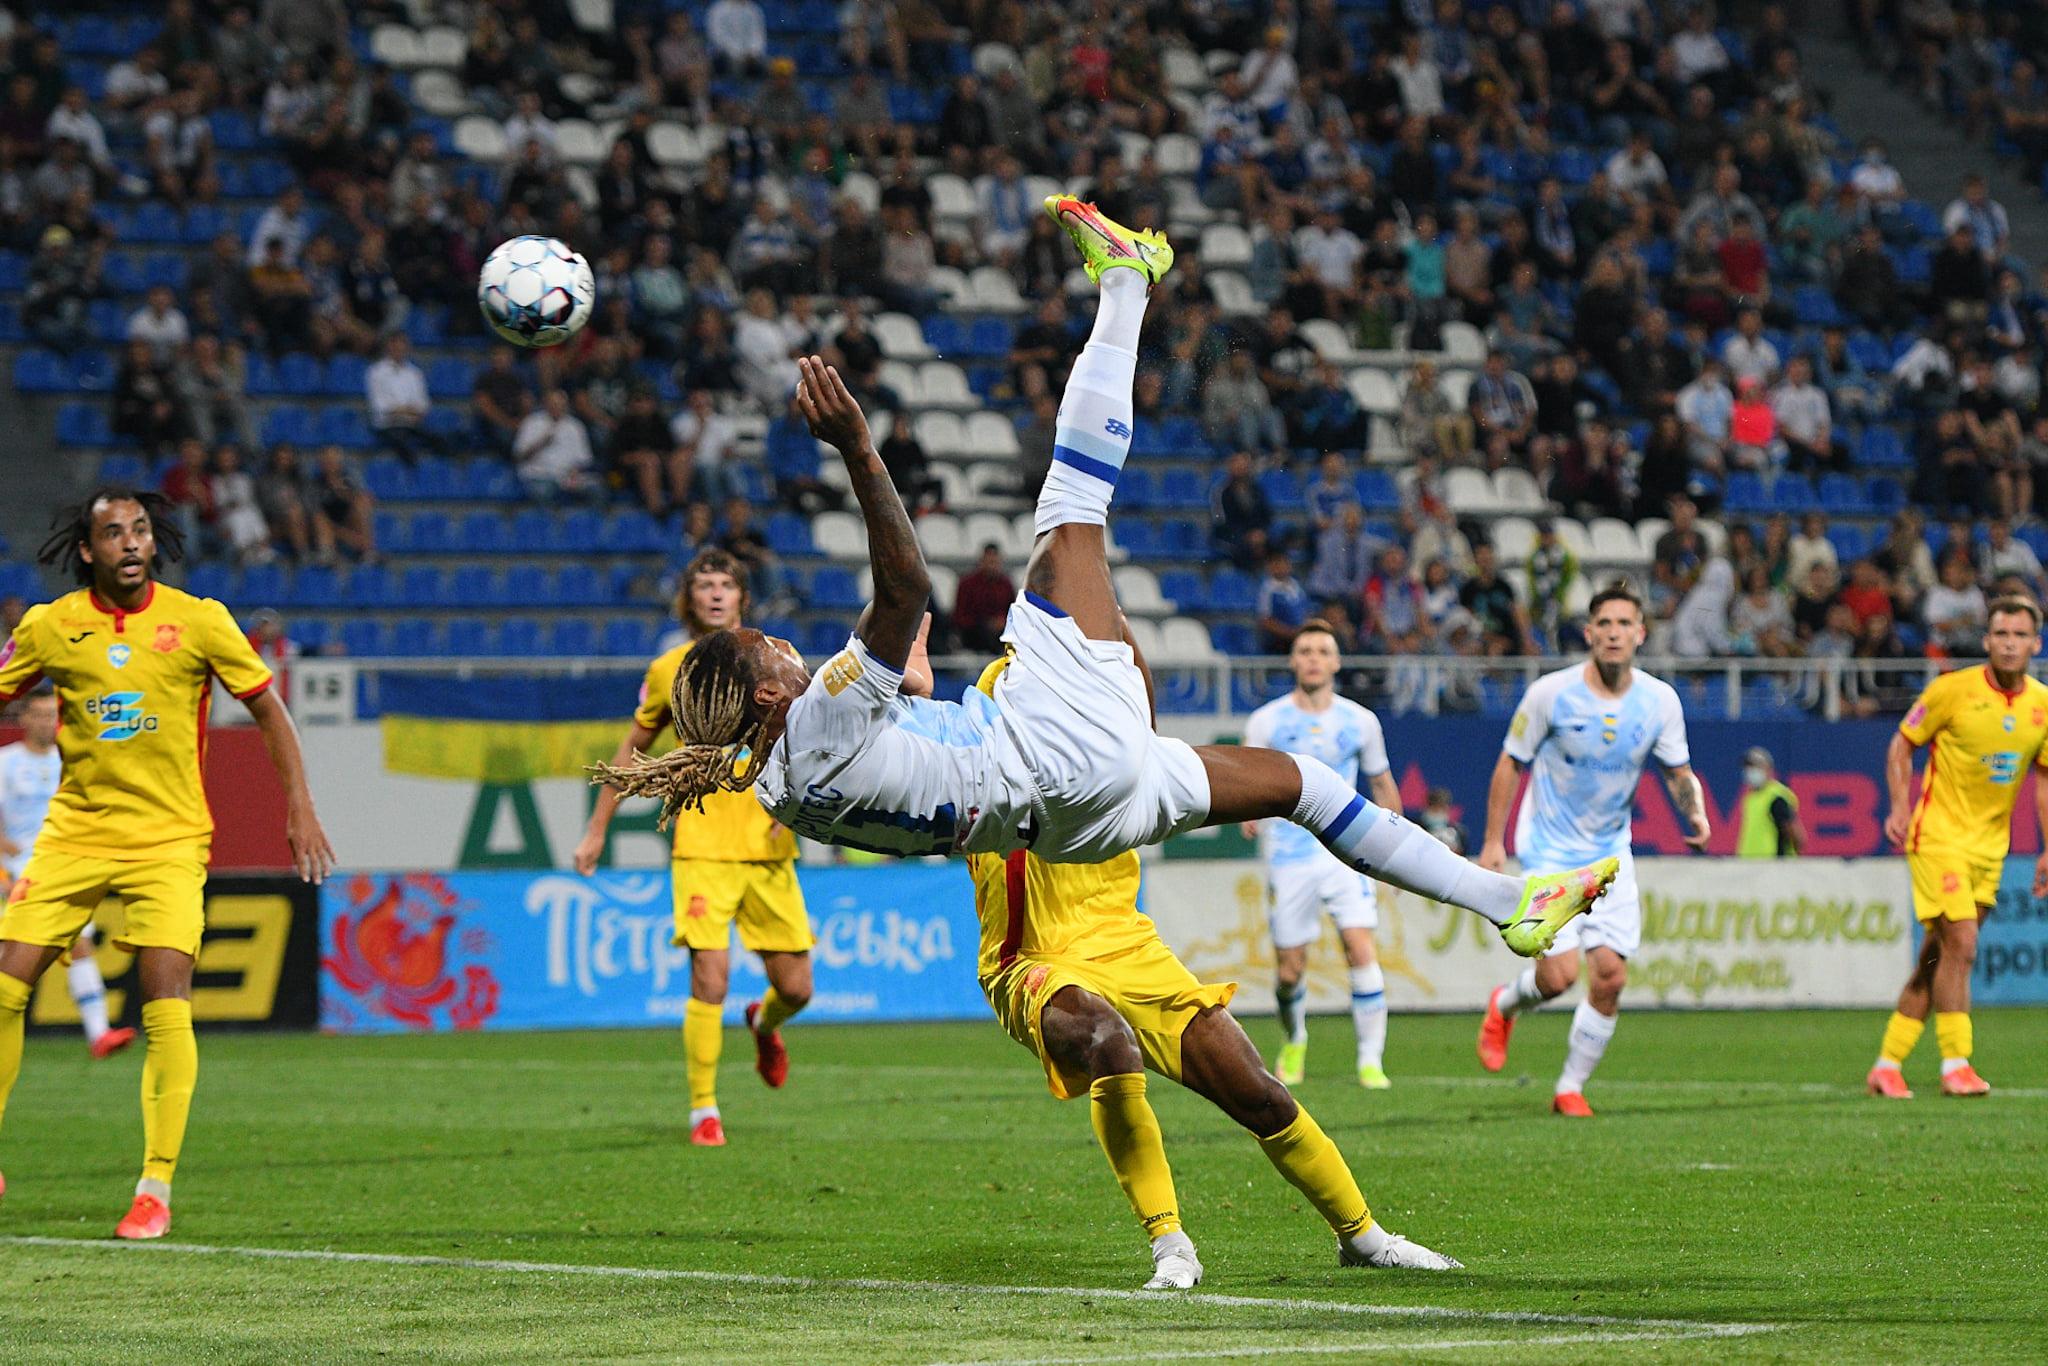 Ингулец, Чемпионат Украины по футболу, Динамо Киев